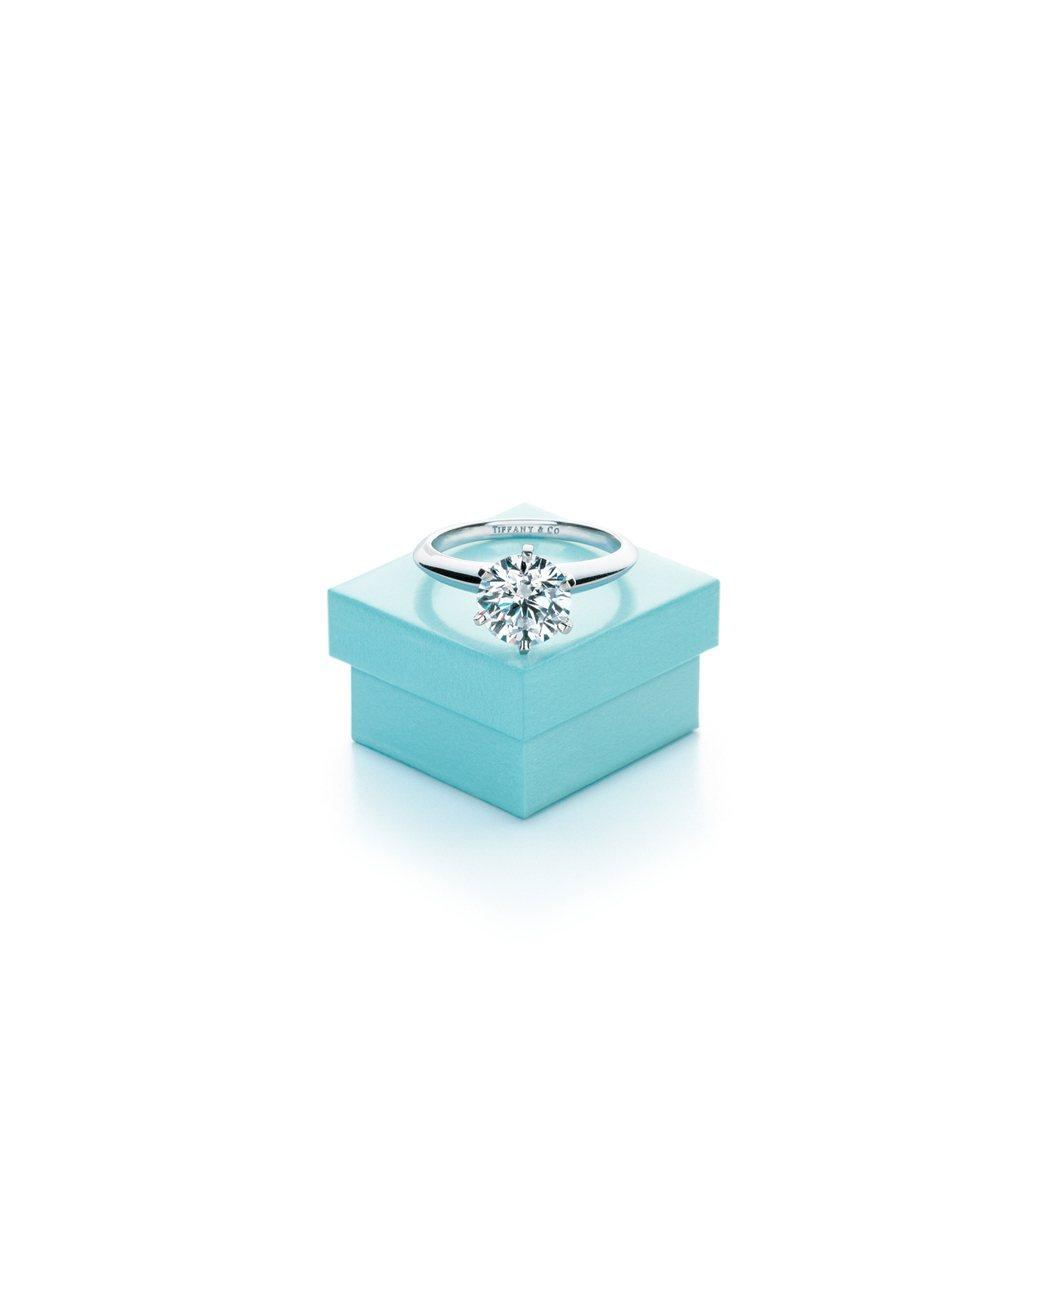 The Tiffany Setting經典六爪鑲嵌鑽戒與Tiffany藍盒。圖/...